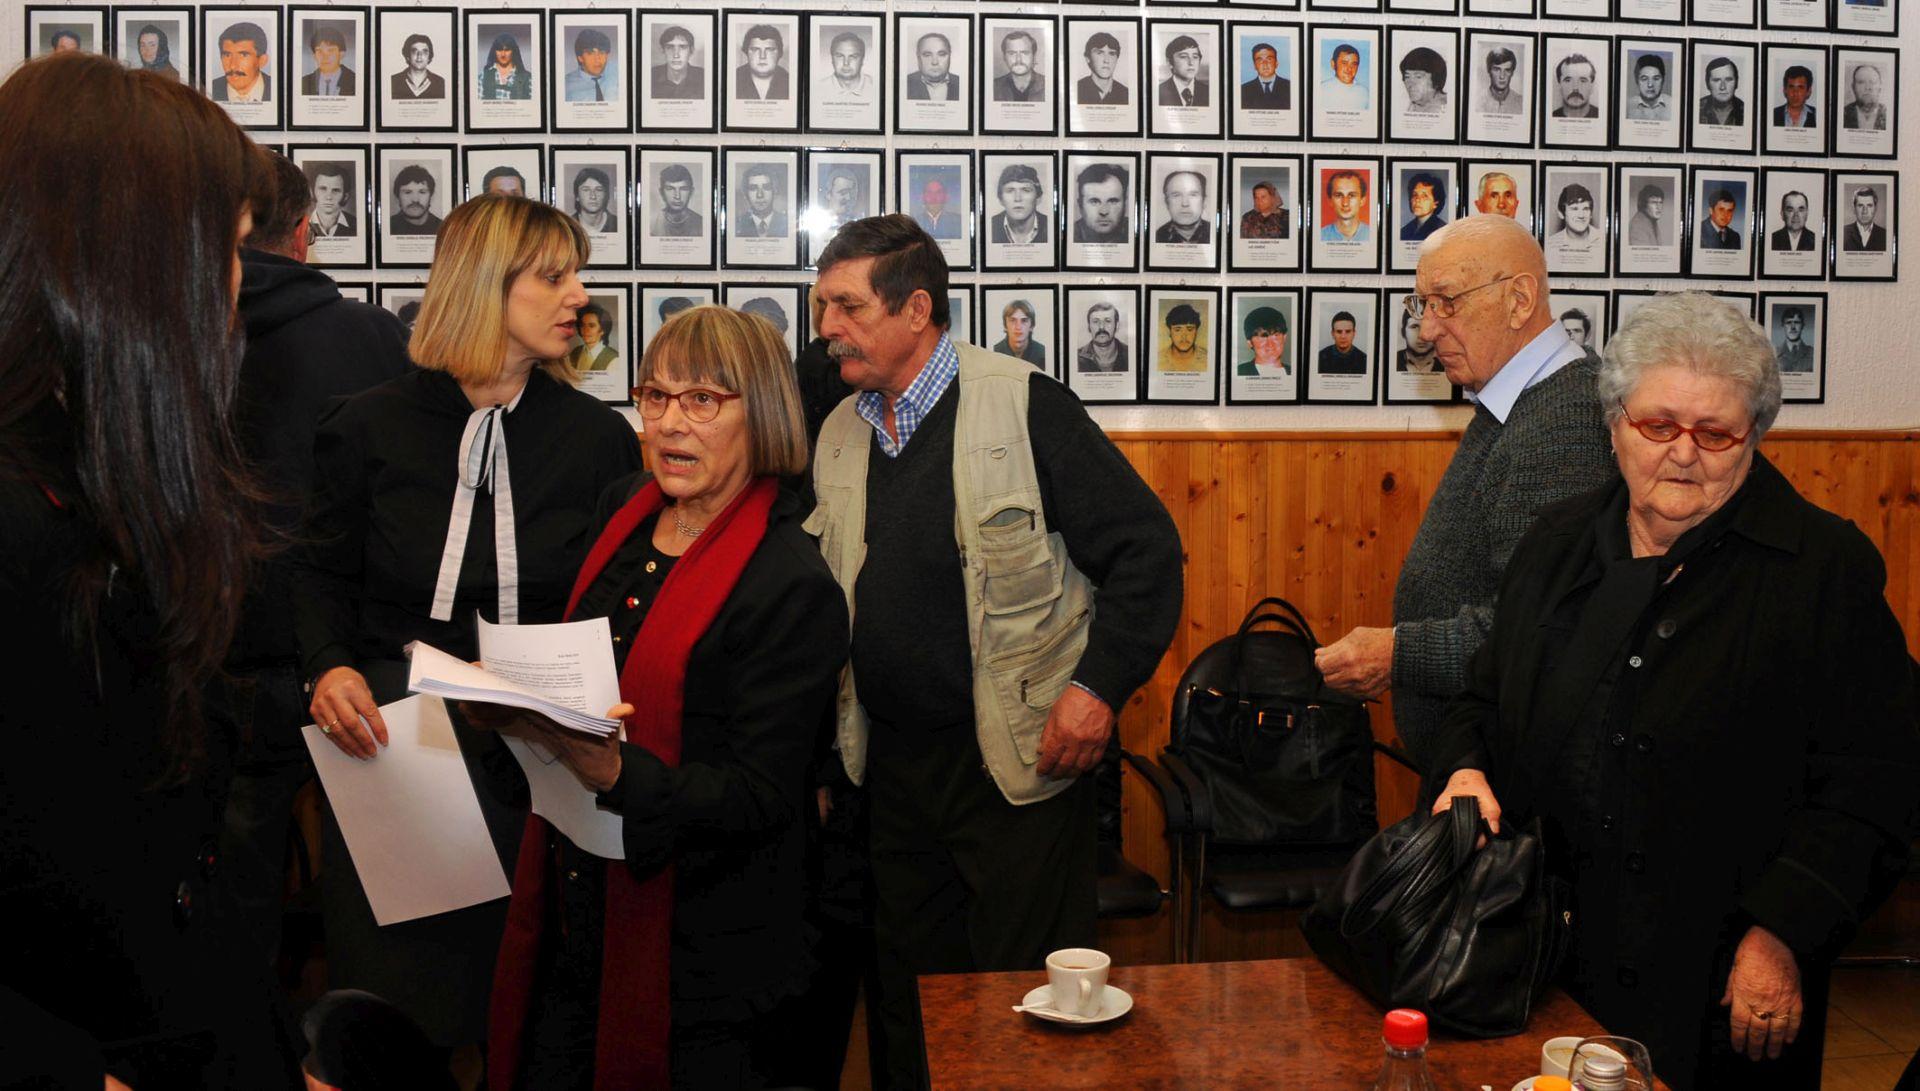 RATNI ZLOČIN U LOVASU: Kaznena prijava protiv generala JNA Dušana Lončara